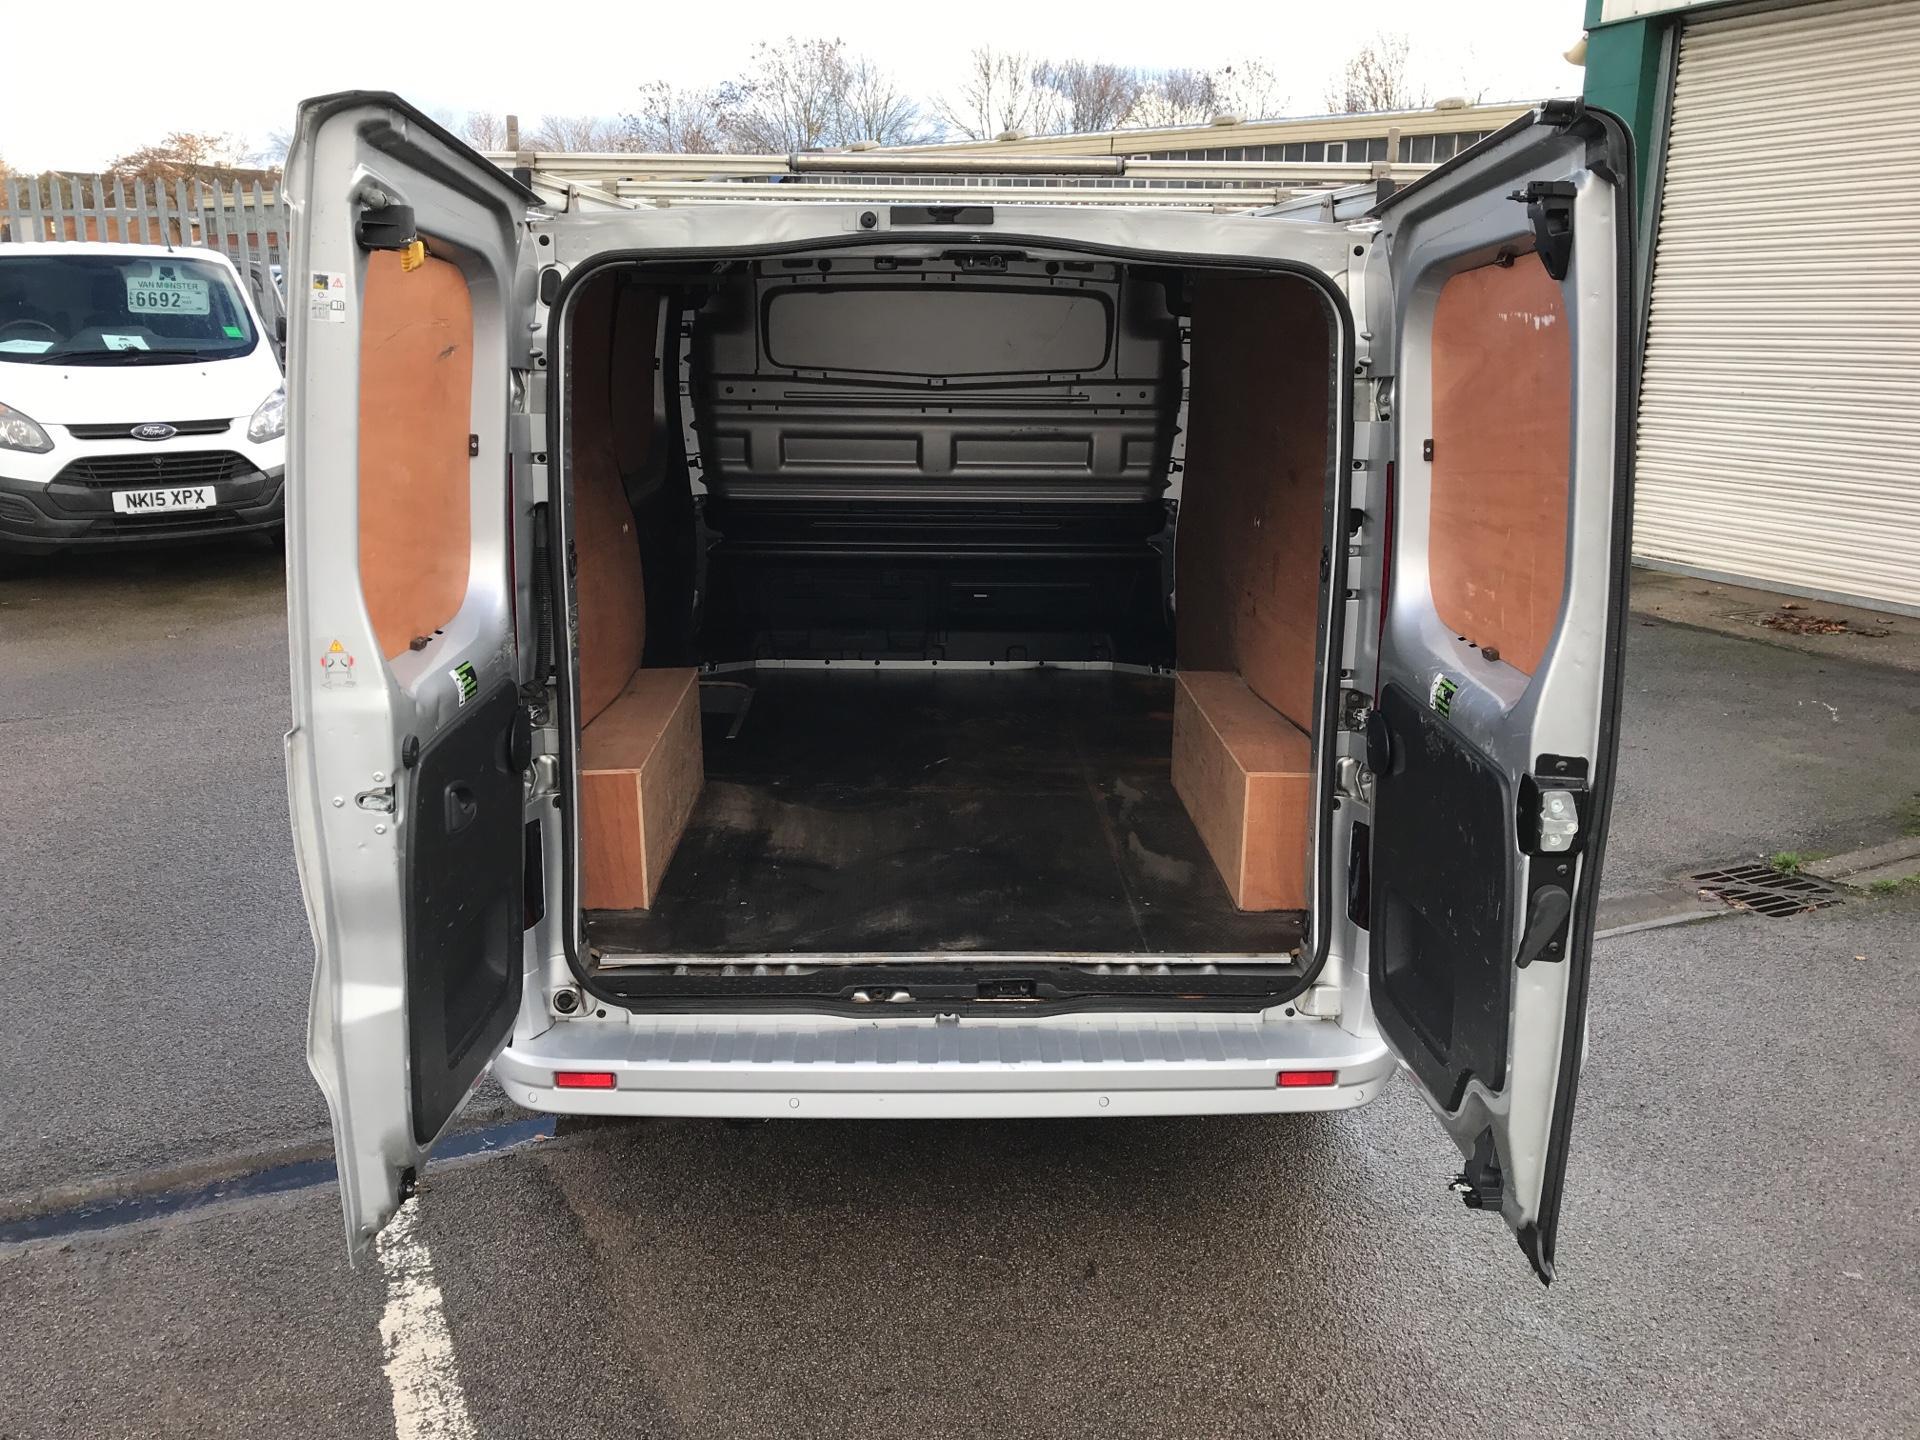 2015 Vauxhall Vivaro L1 H1 2700 1.6 BITURBO 120PS ECOFLEX SPORTIVE EURO 5 (DP15LGO) Image 16